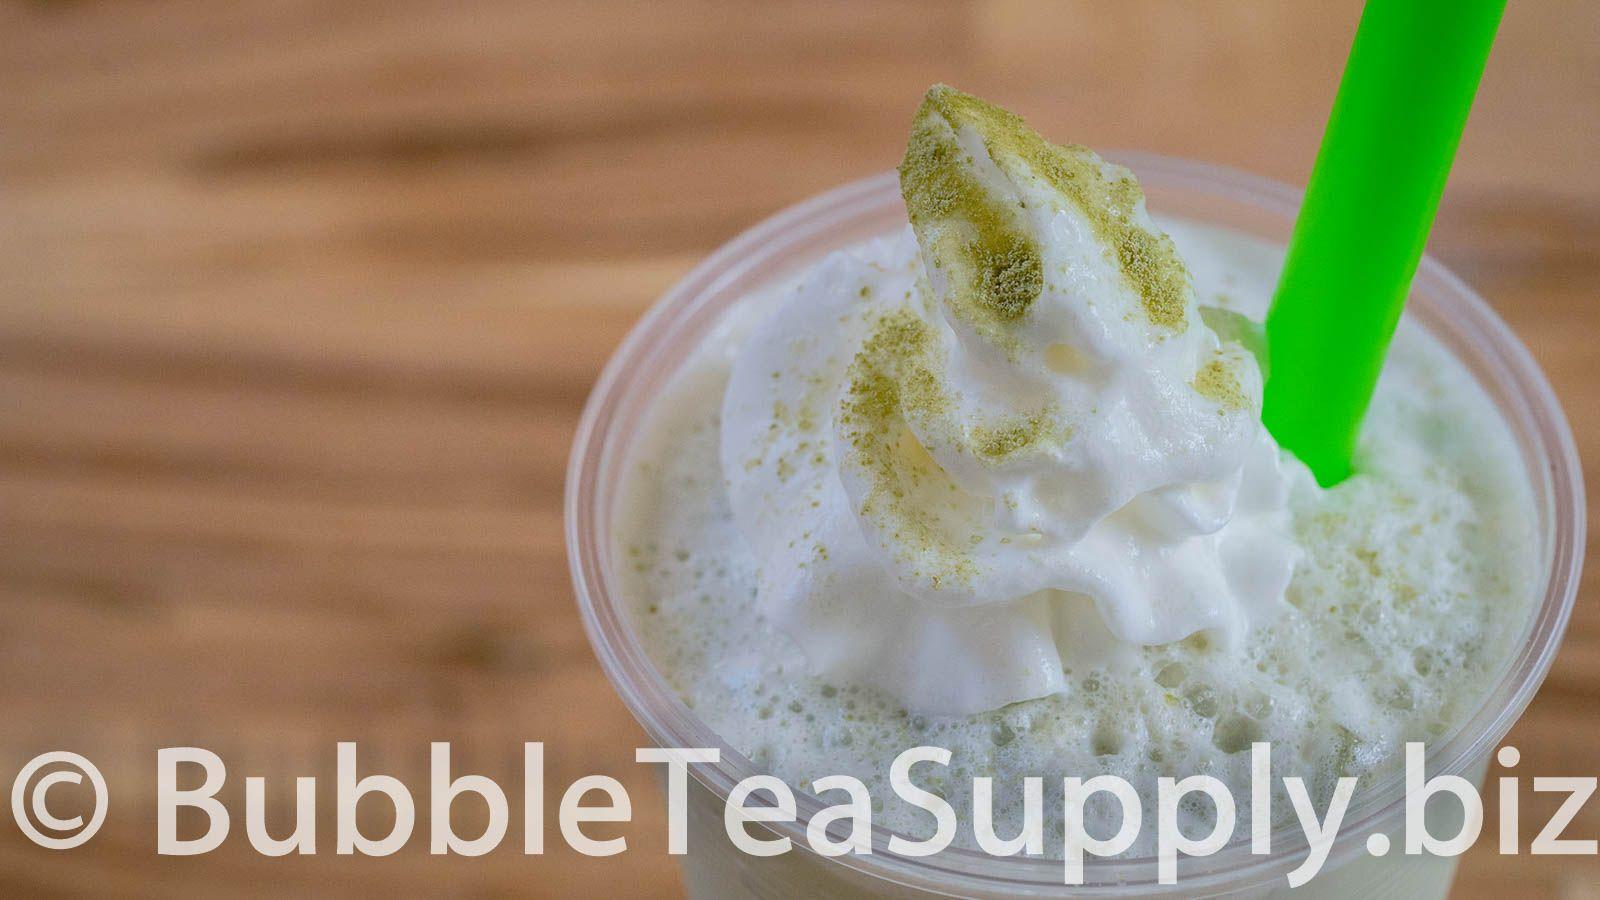 how to make green tea latte bubble tea with boba tapioca pearls recipe with images bubble tea flavored tea pinterest